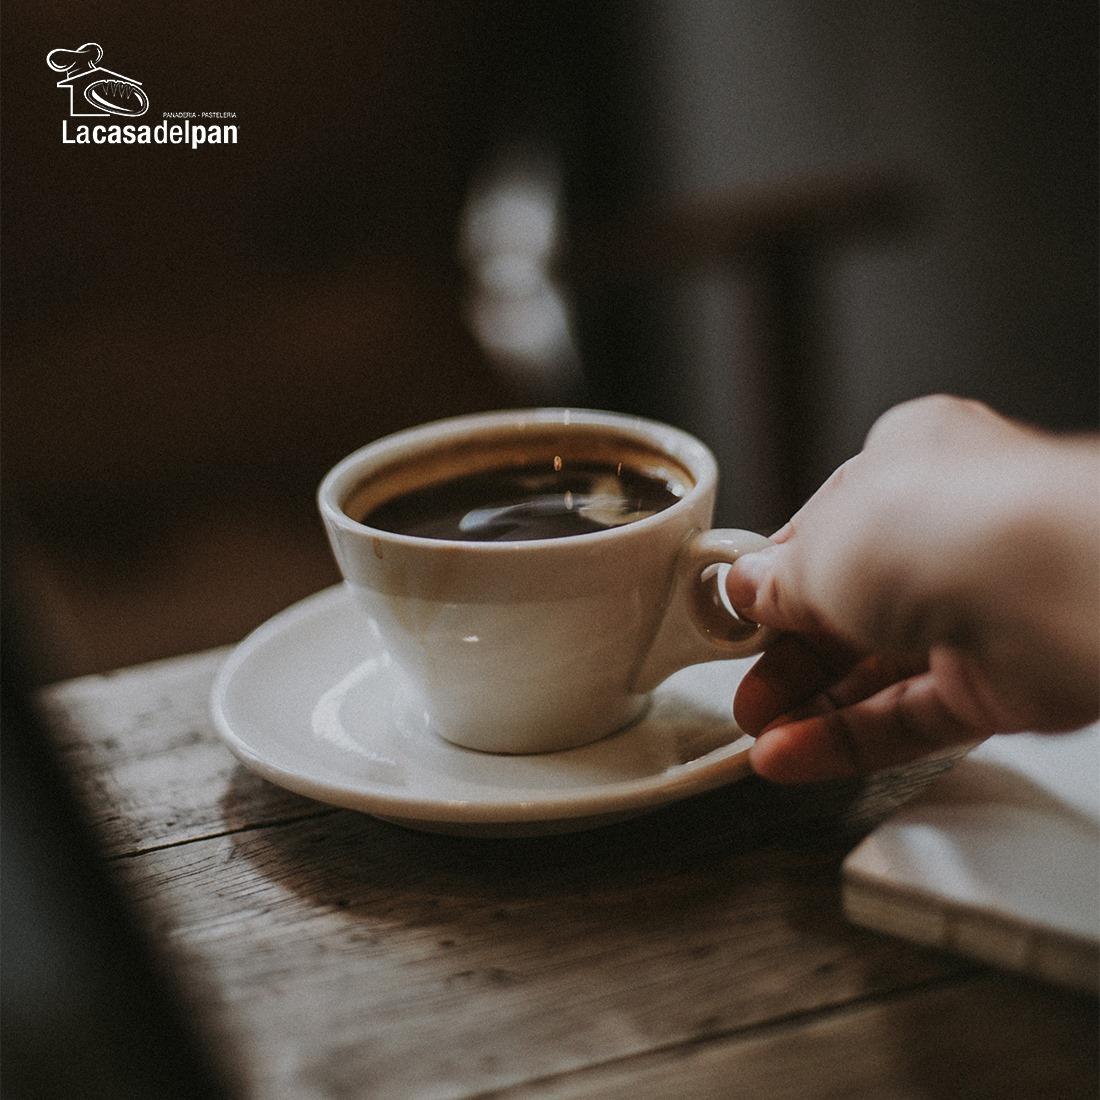 For cold days a good cup of coffee is the perfect option! 908-352-4860 | 550 D North Ave Union Township | http://www.lacasadelpannj.com - Para los días fríos un cafecito caliente siempre cae bien. ☕☕ - #Coffee #LaCasaDelPanbakery #NewJersey